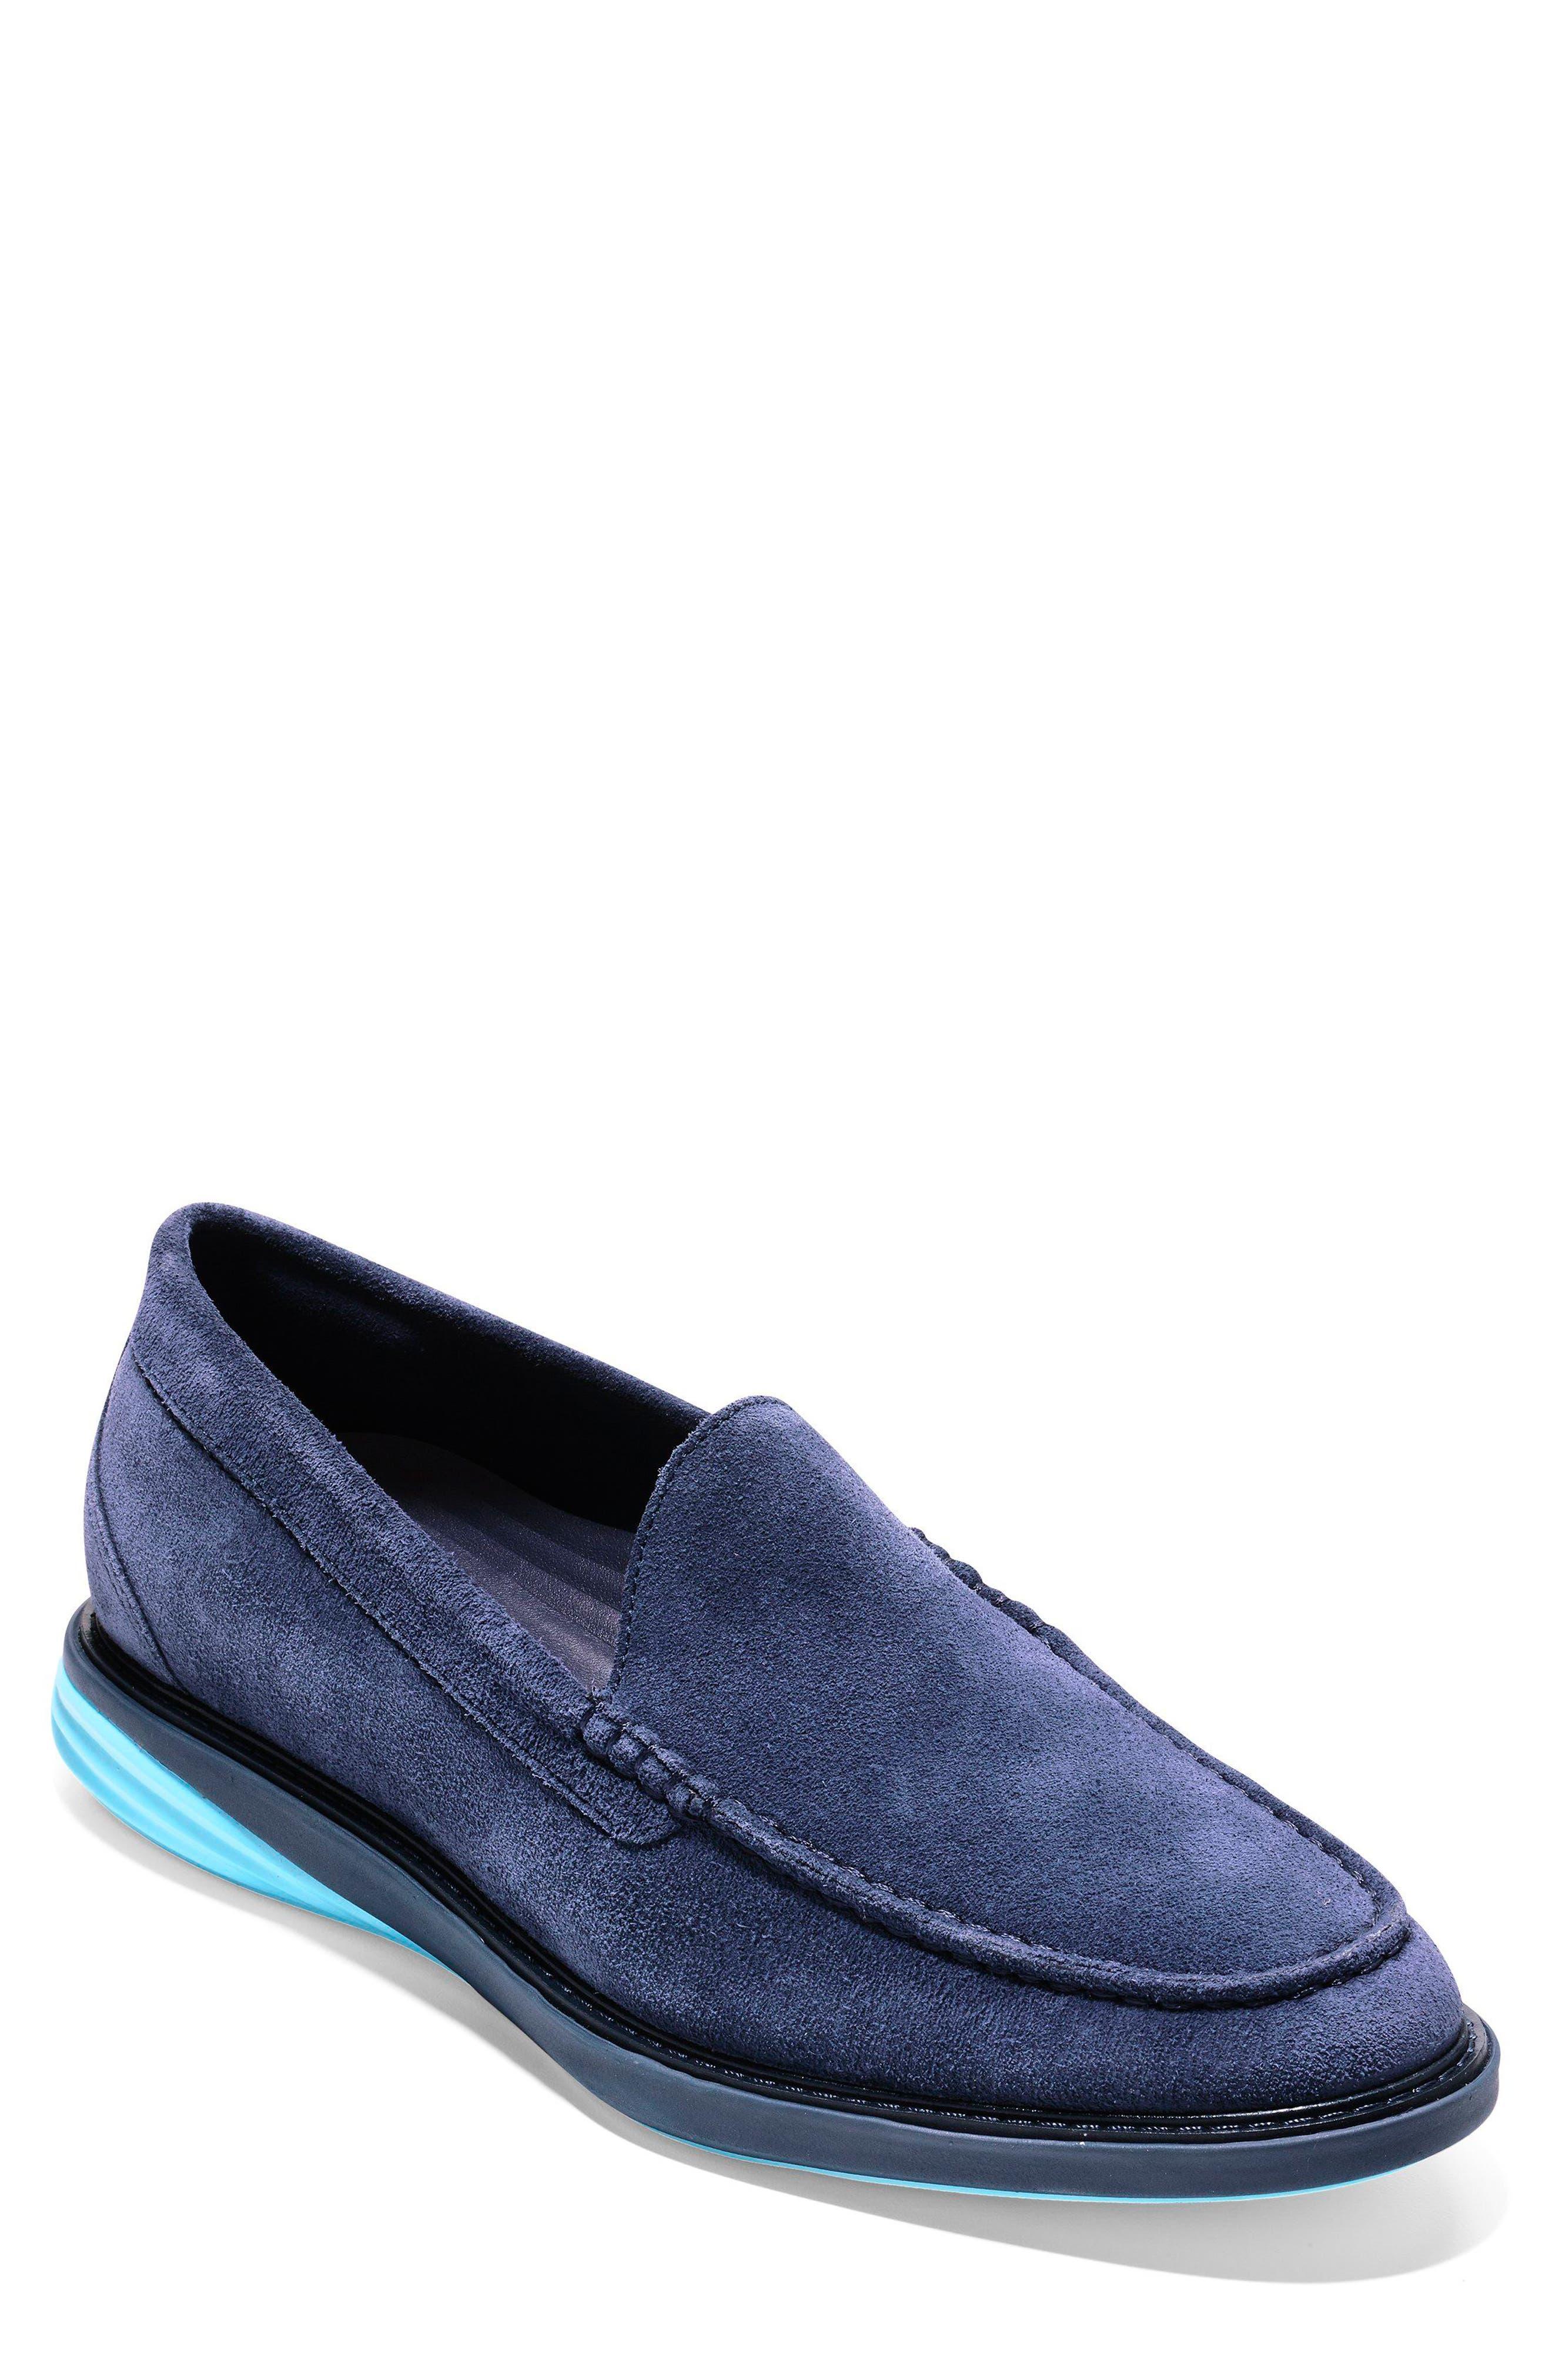 GrandEvølution Venetian Loafer,                             Main thumbnail 1, color,                             Marine Blue Suede